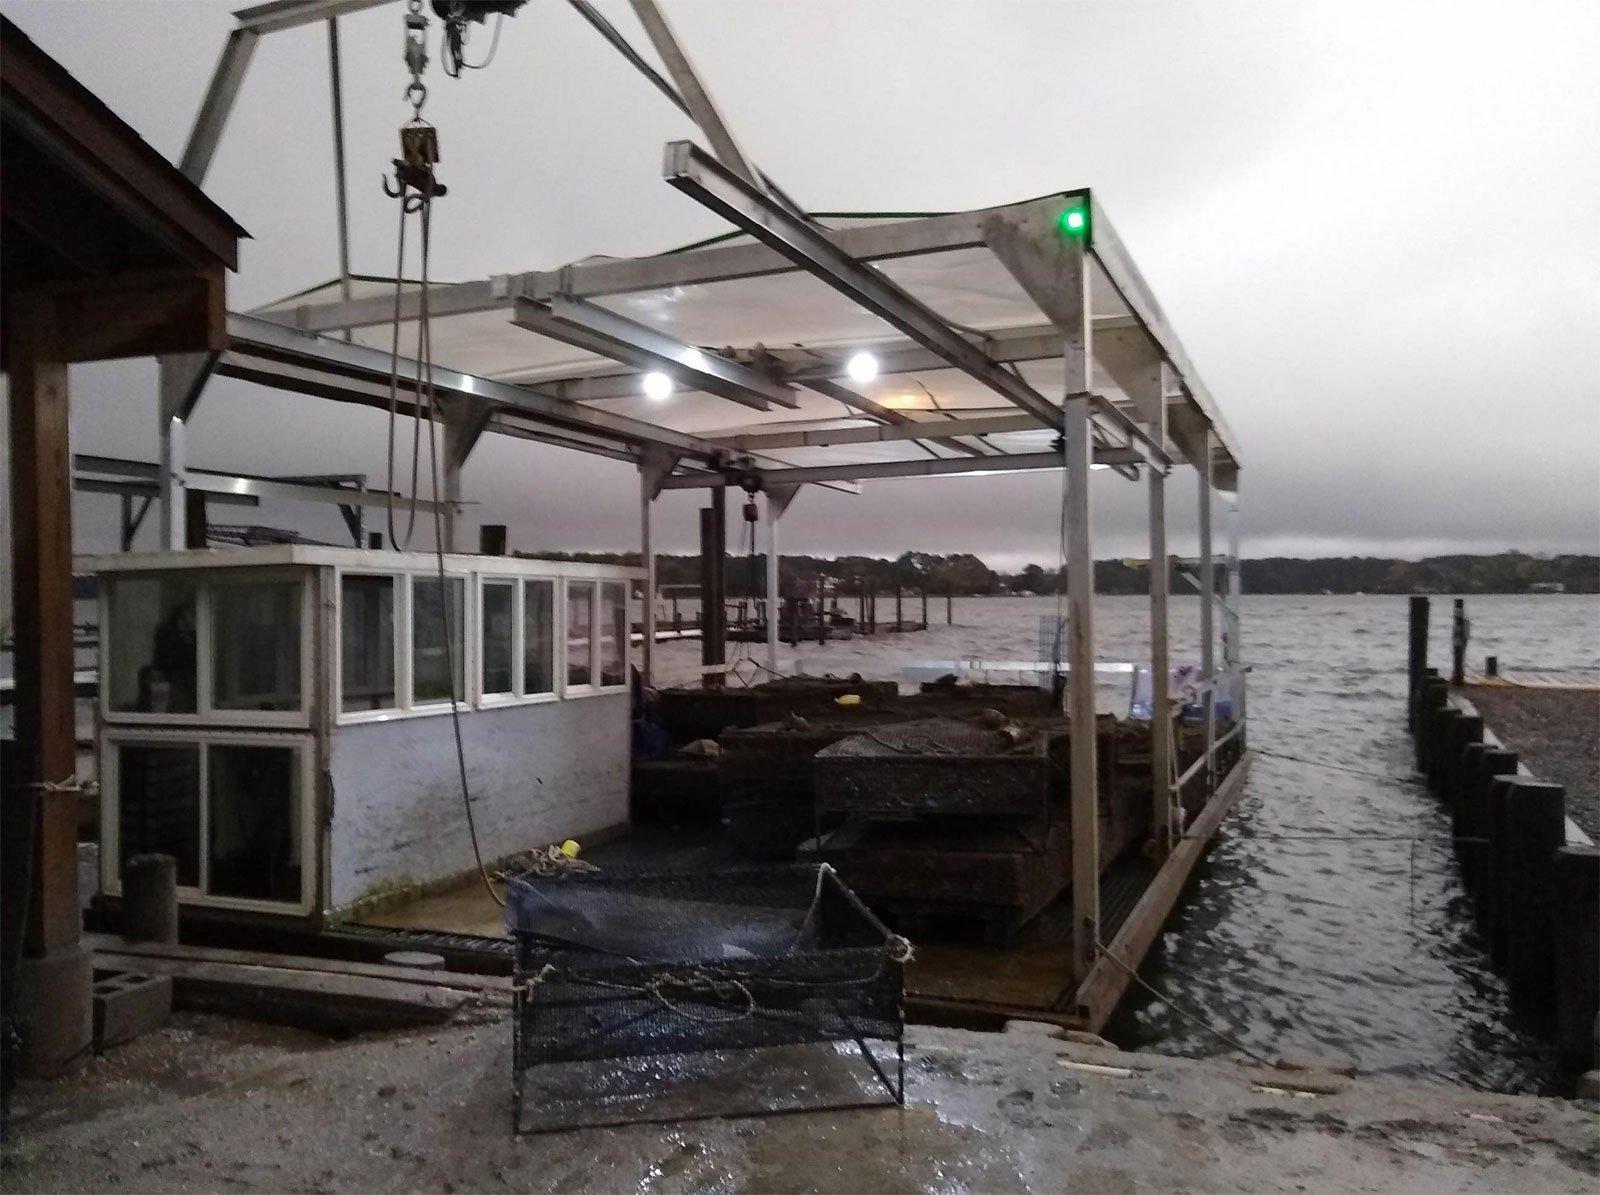 Ward Oyster Company - Aquaculture Oyster Farm - Gloucester Virginia - Quality Seafood